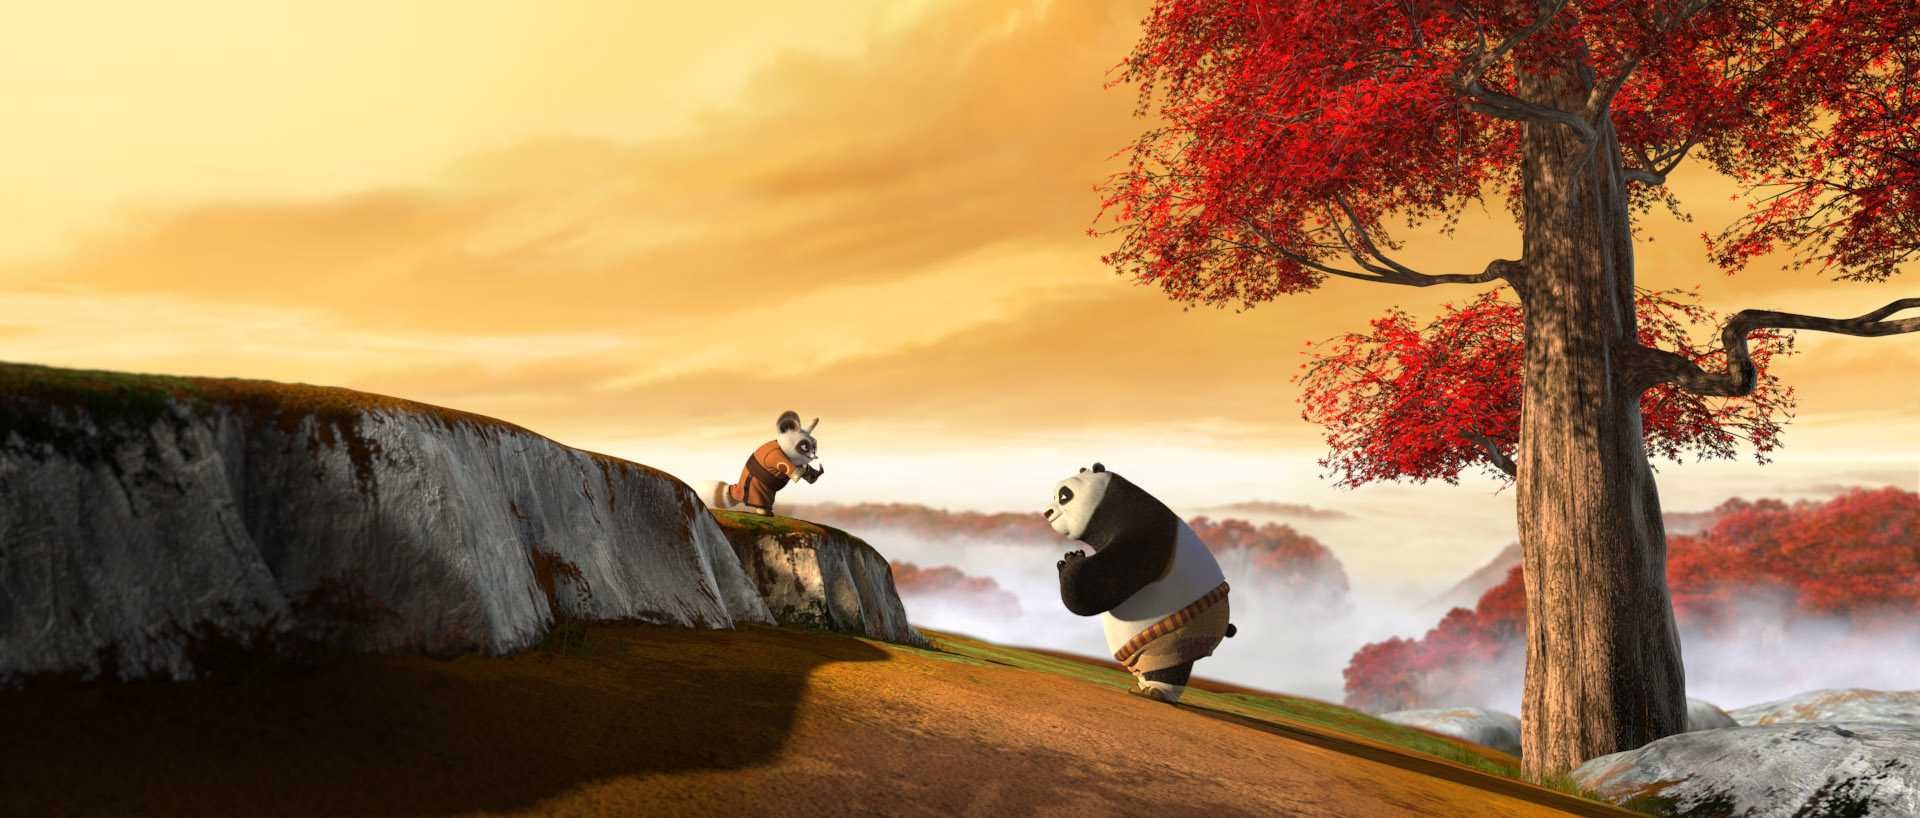 Кунг-фу Панда, кадр № 12